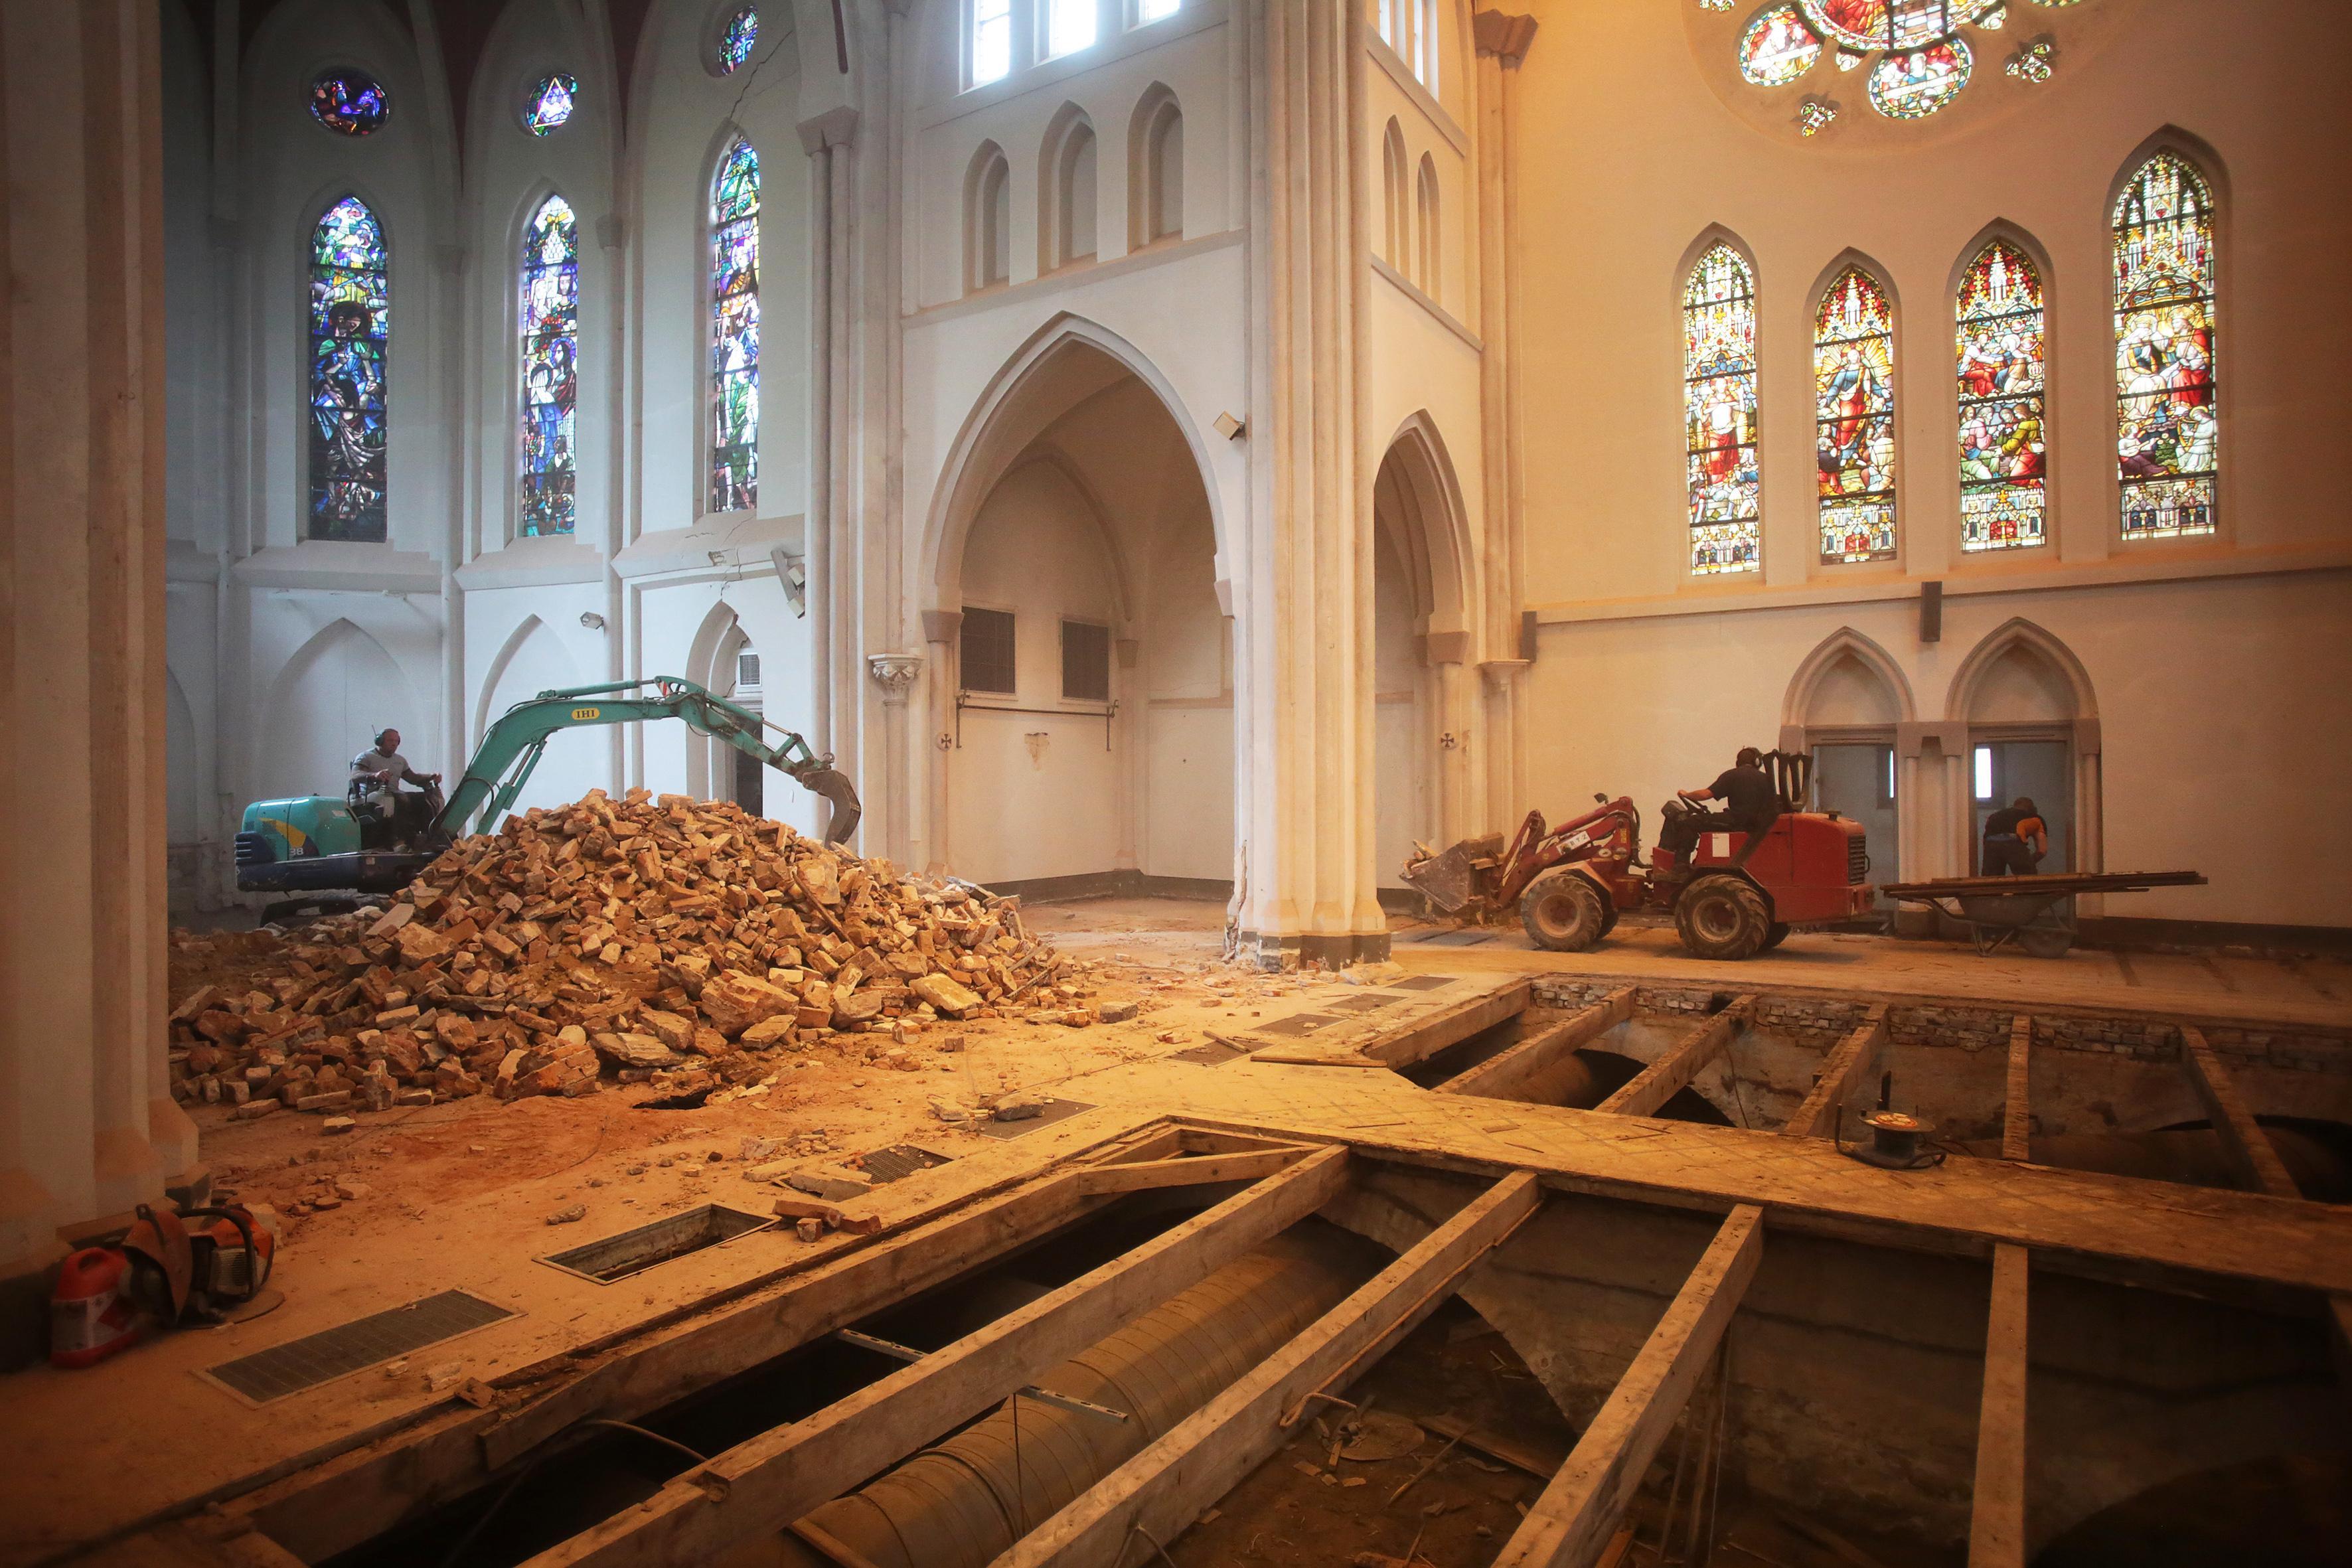 Eerste paal voor herstelwerk aan Laurentiuskerk Weesp